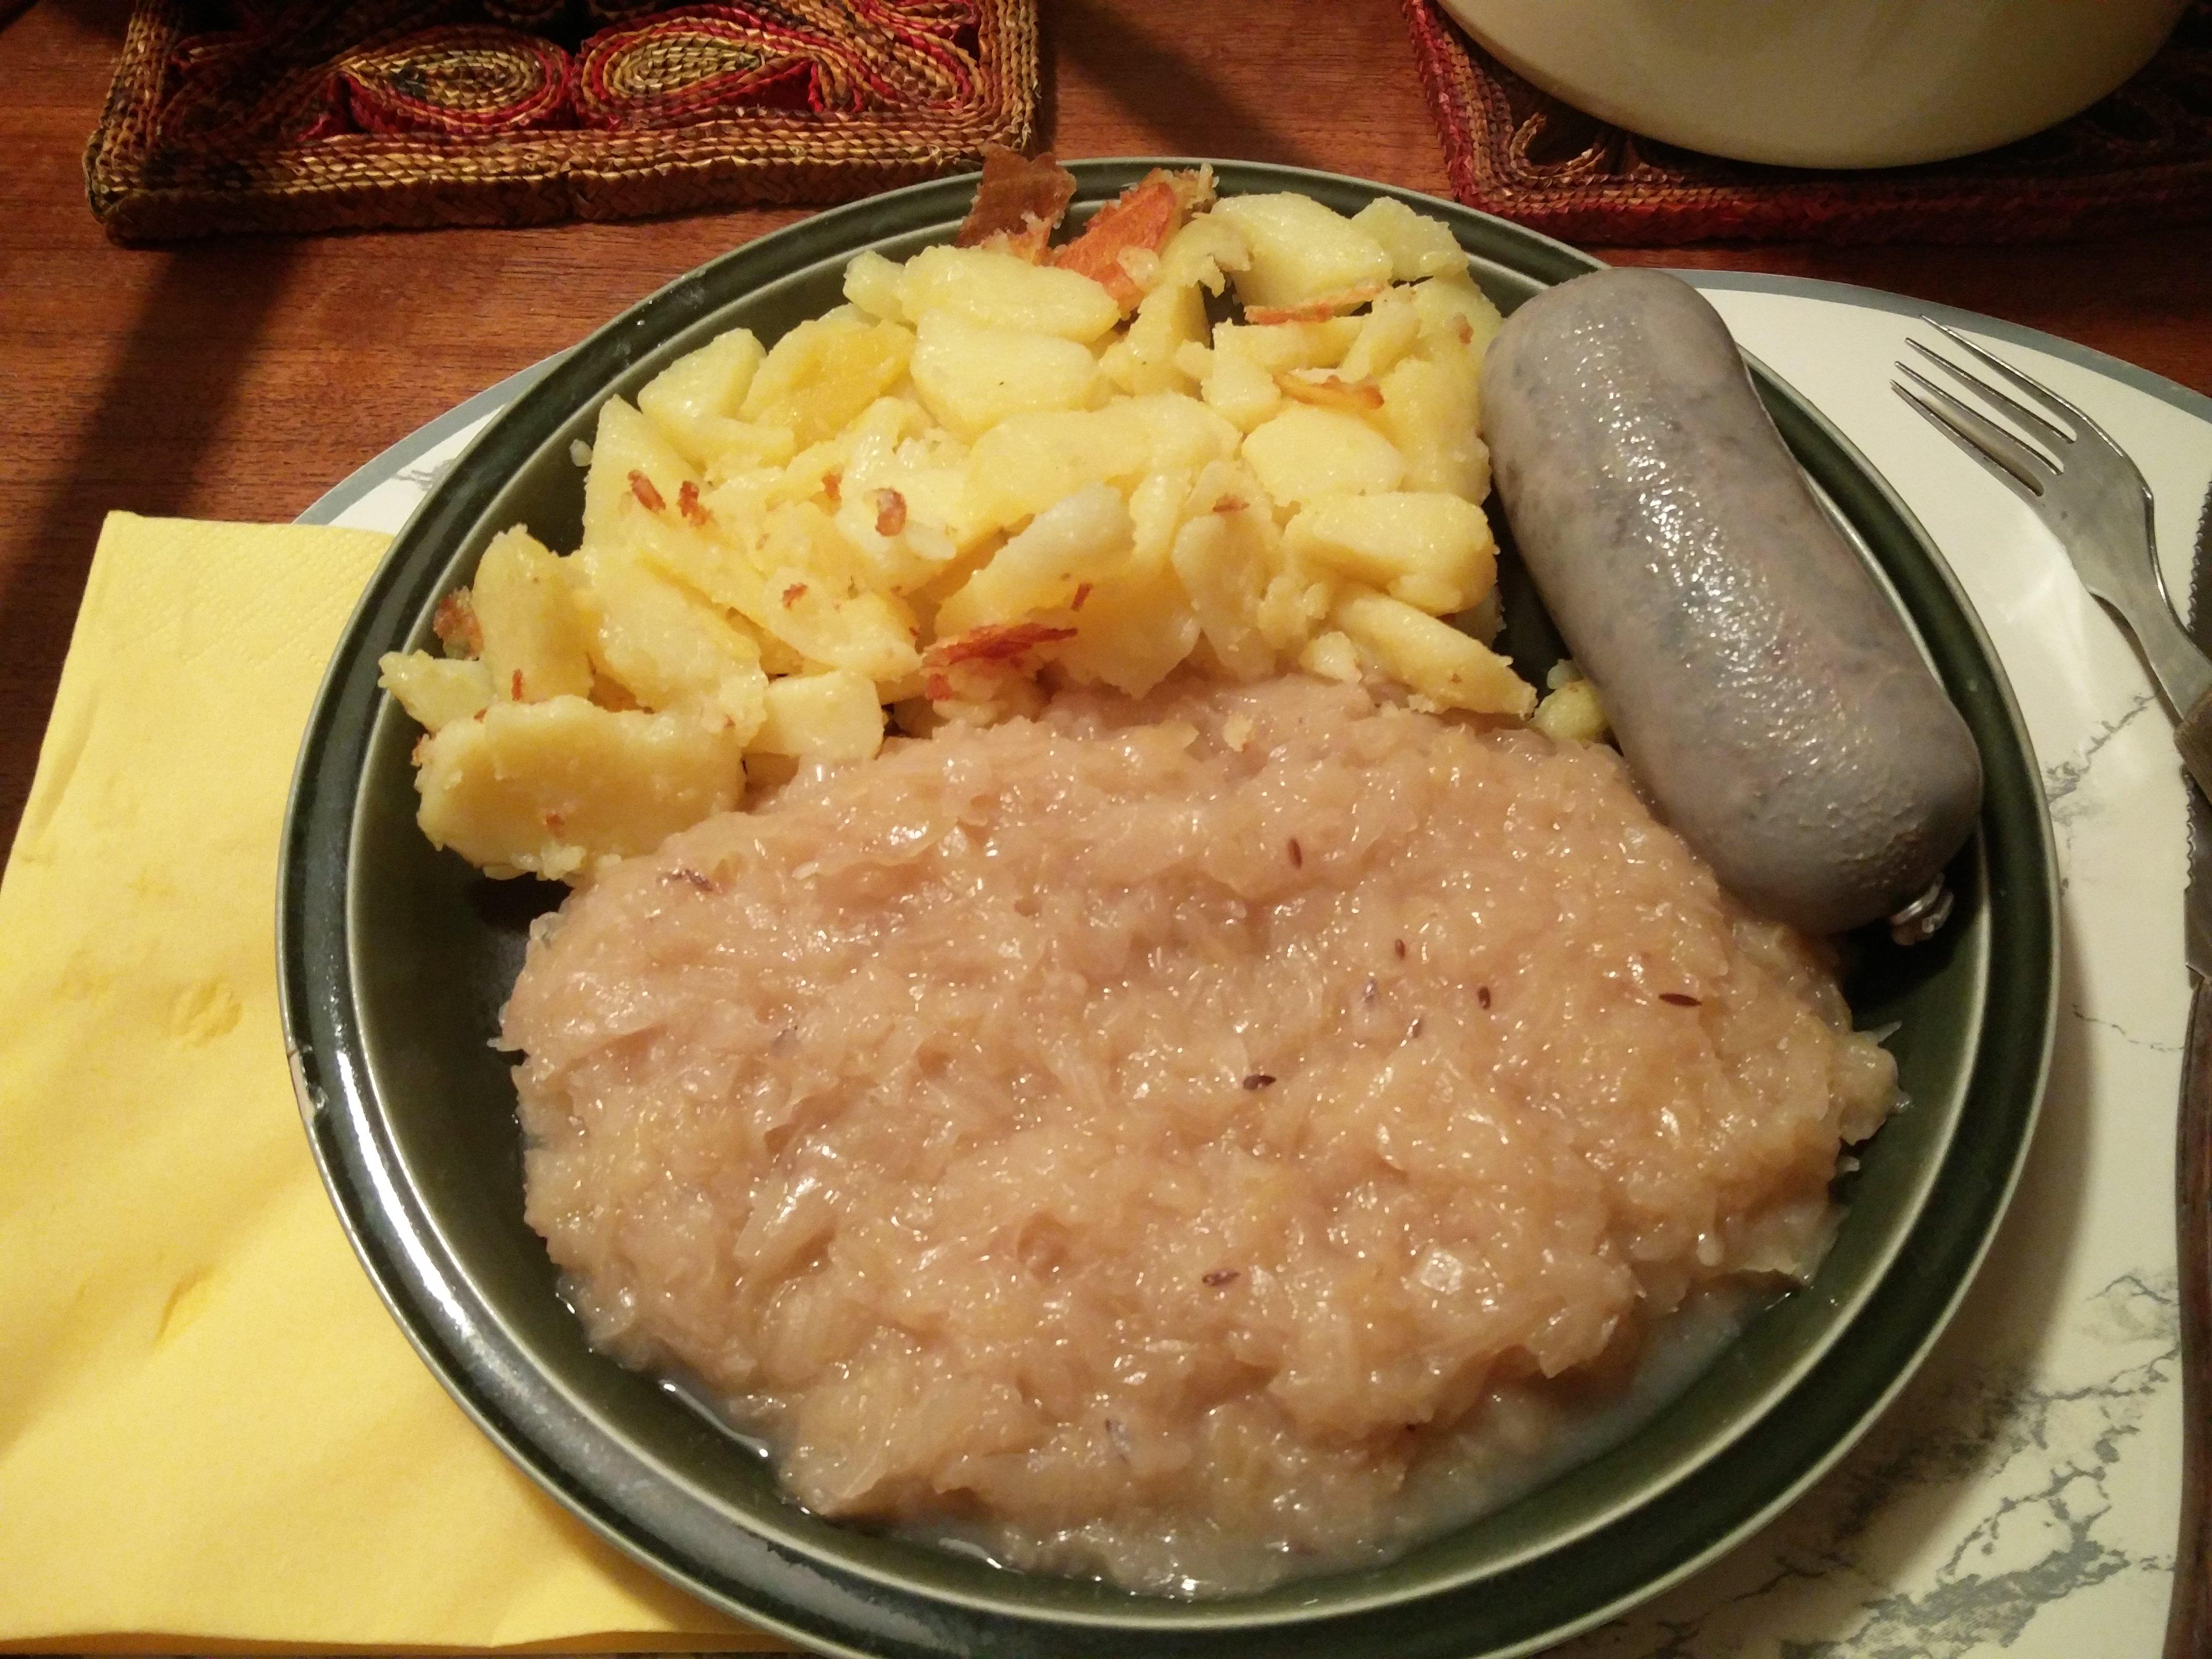 https://foodloader.net/nico_2016-11-09_leberwurst-bratkartoffeln-sauerkraut.jpg